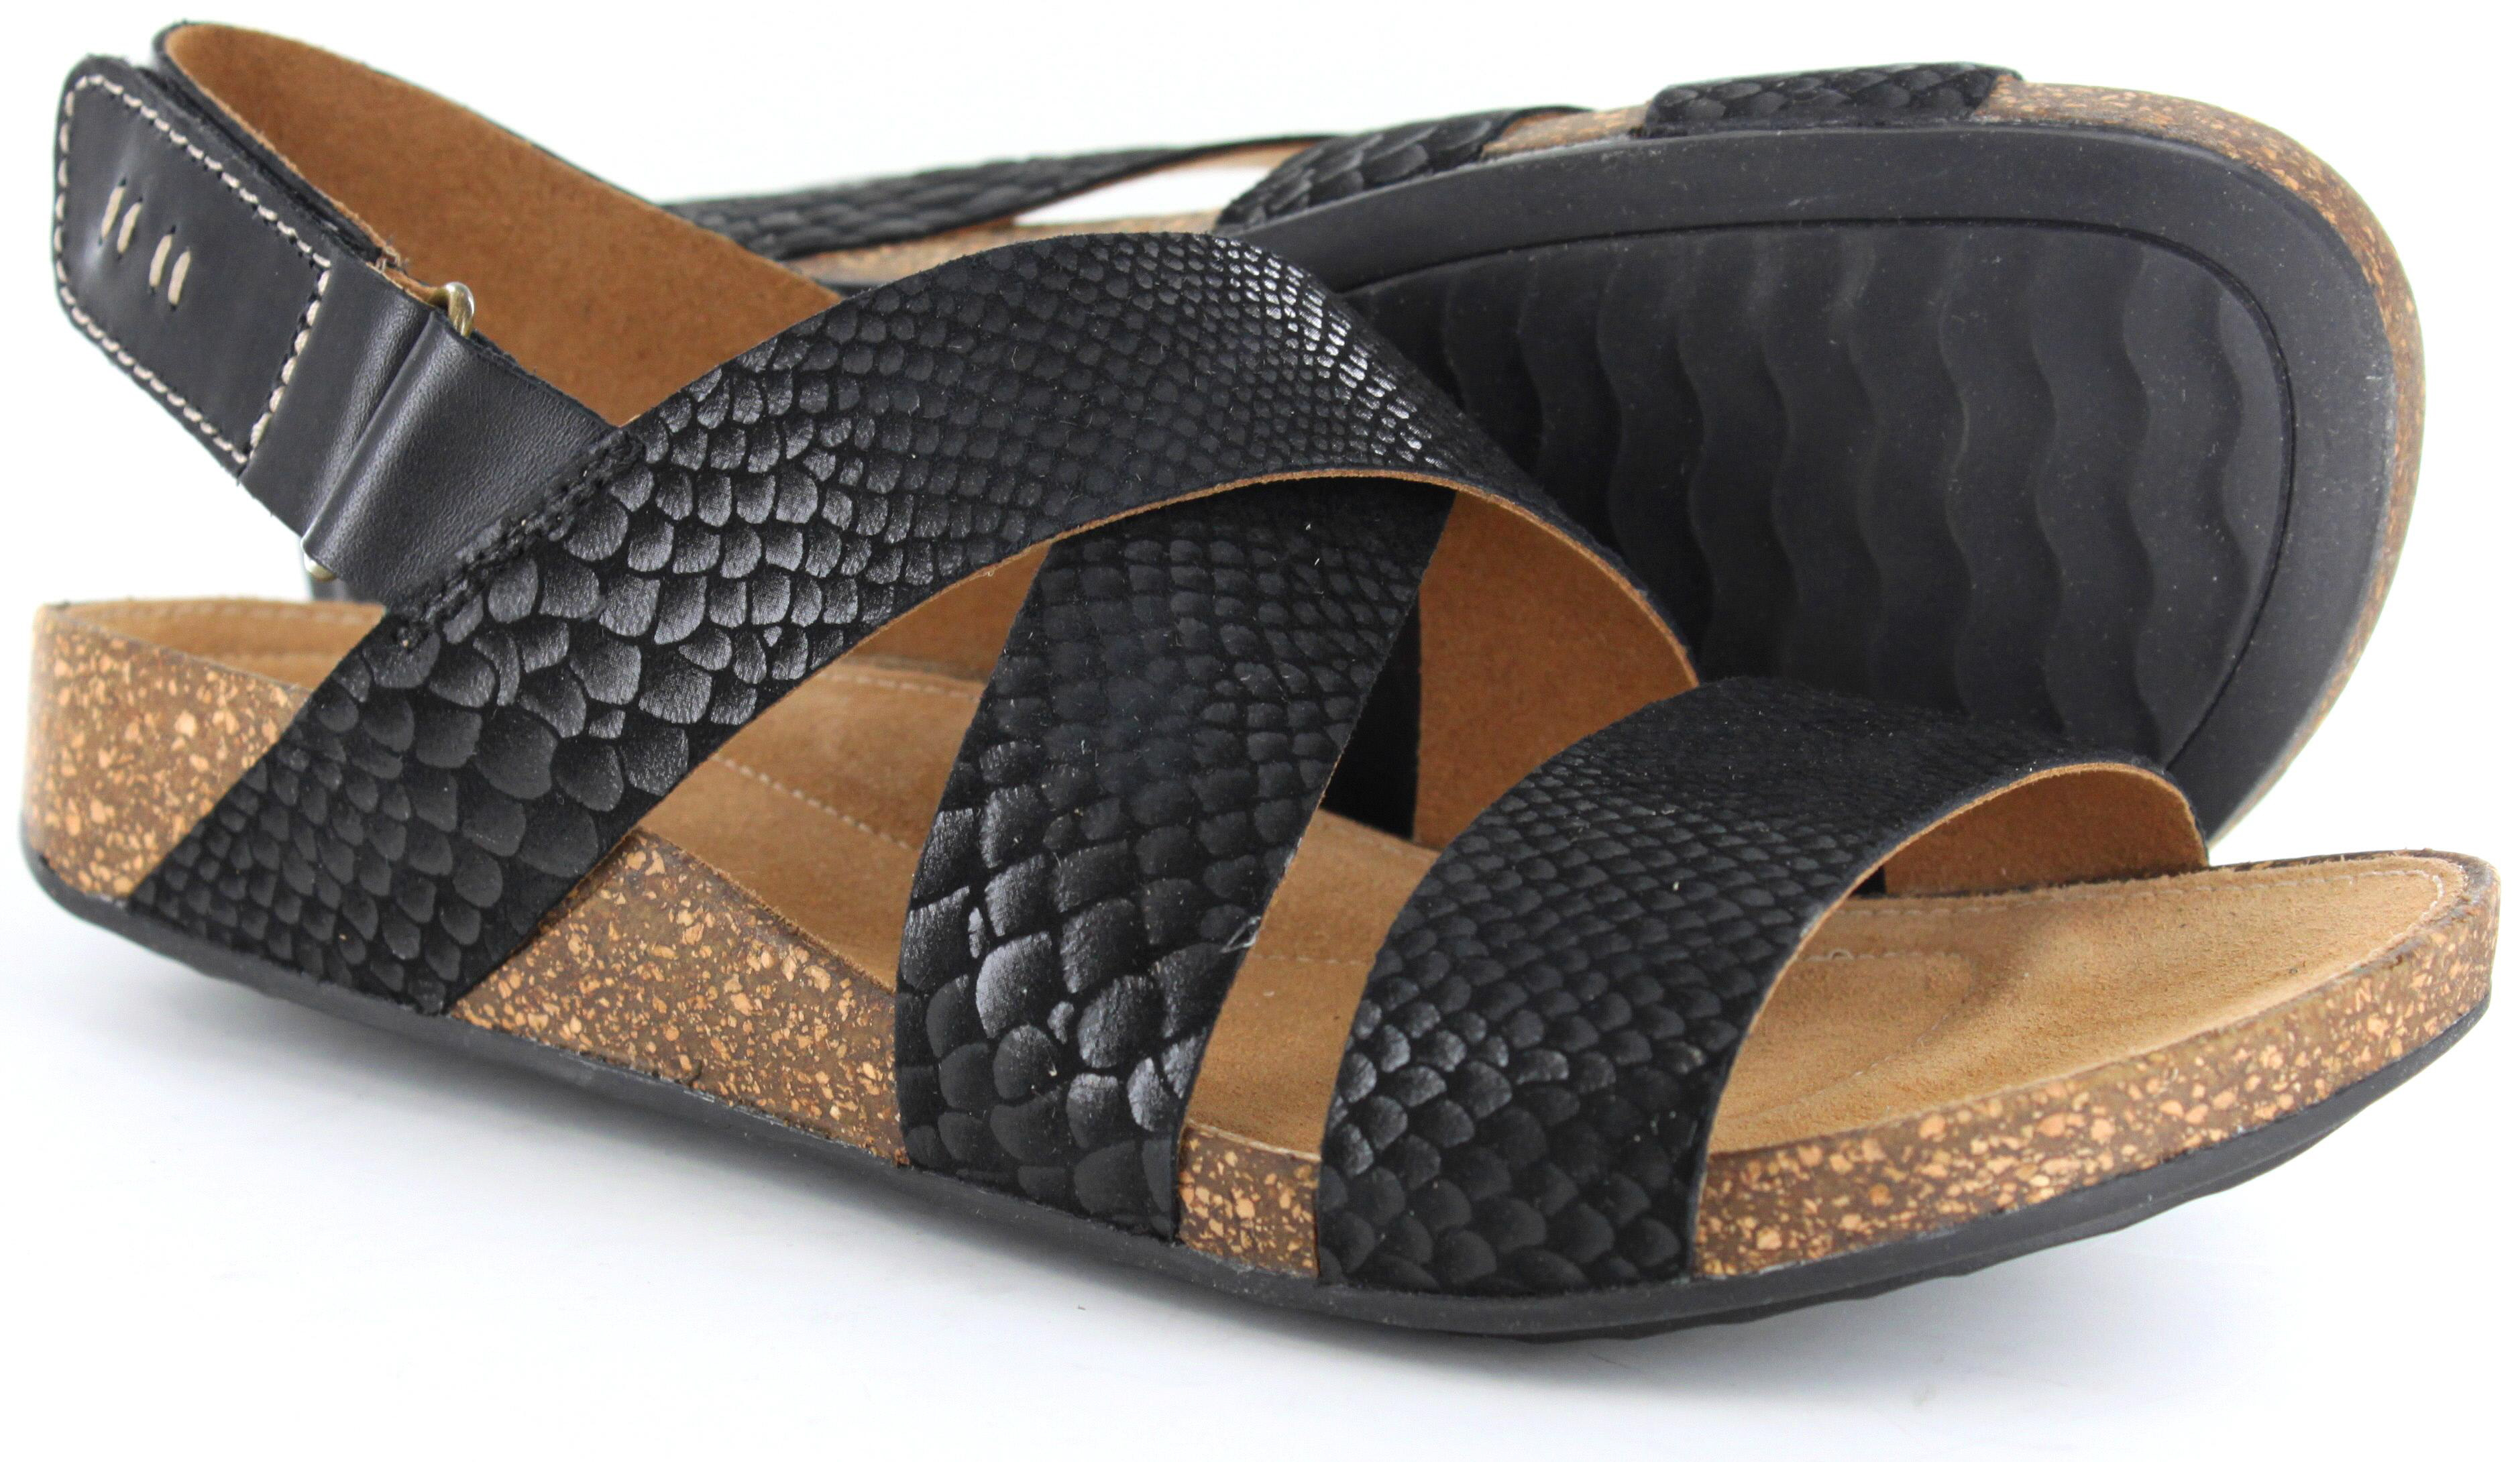 merrell adhera sandals size 9 9k